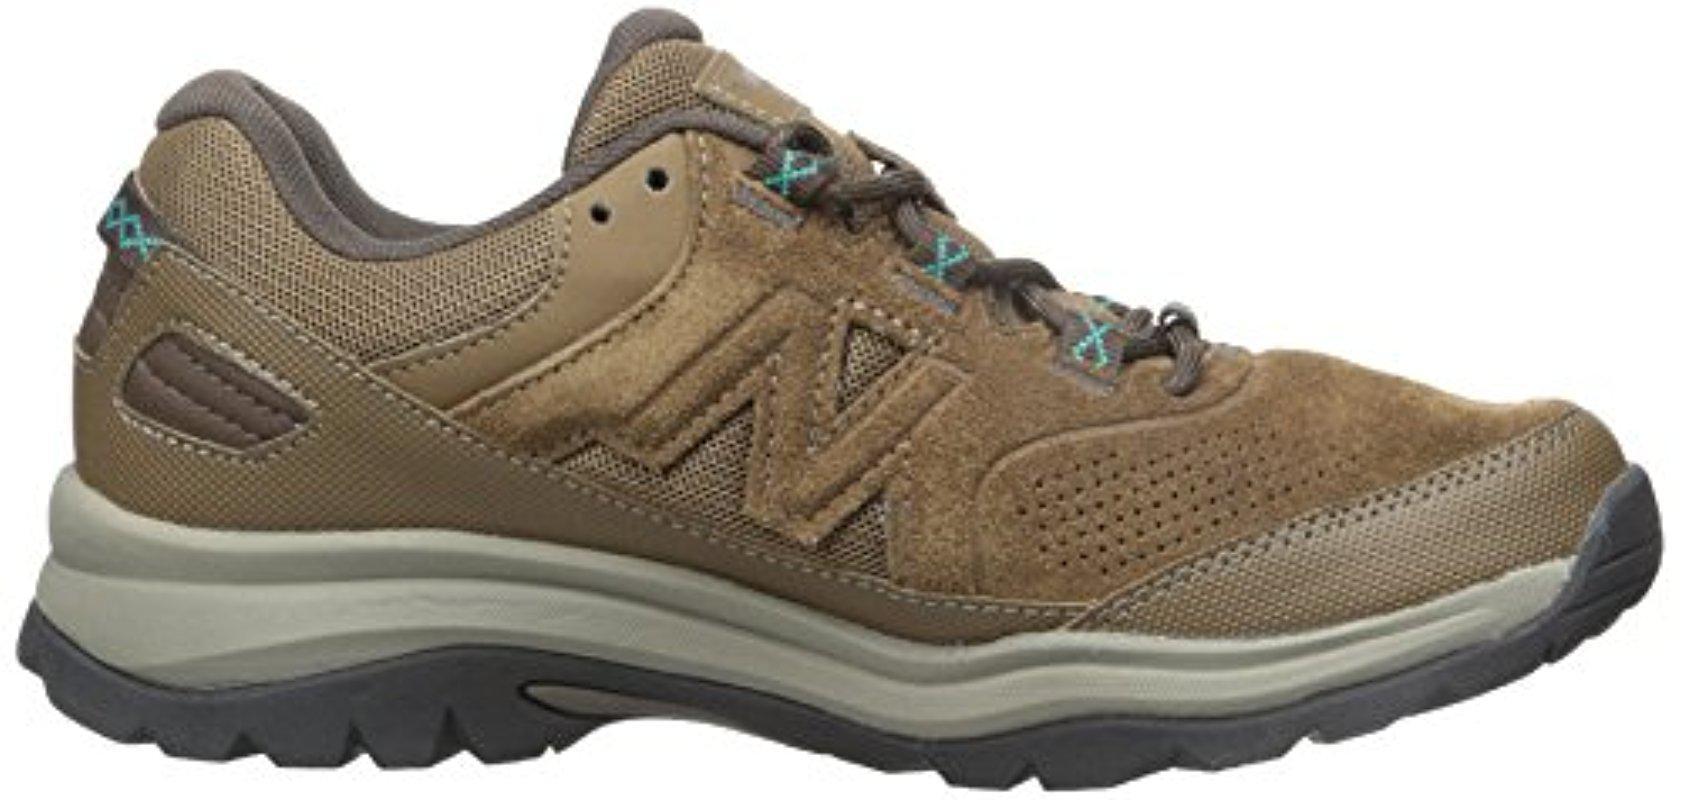 New Balance Lace Ww769v1 Walking Shoe